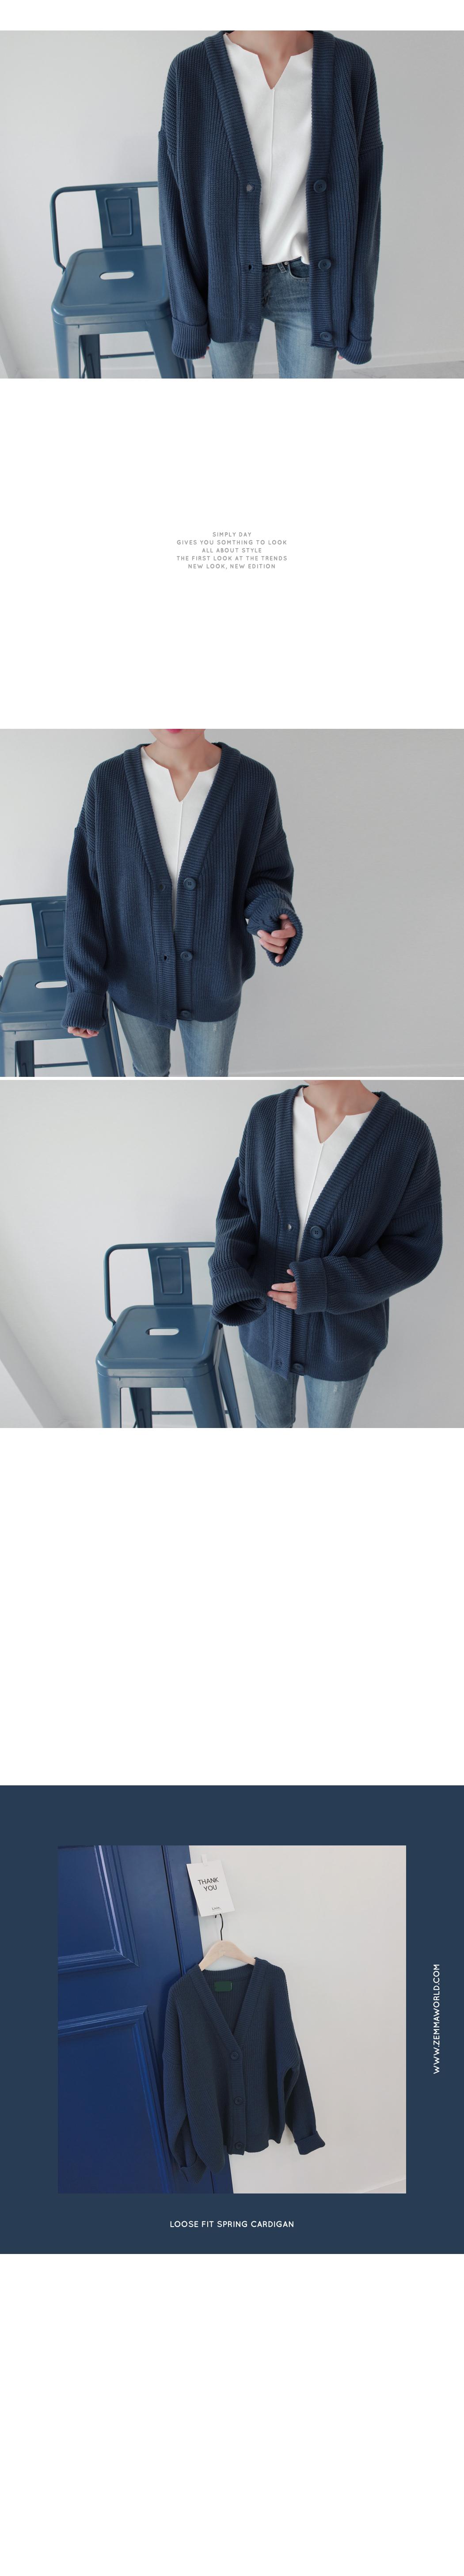 Latte loose fit knit cardigan